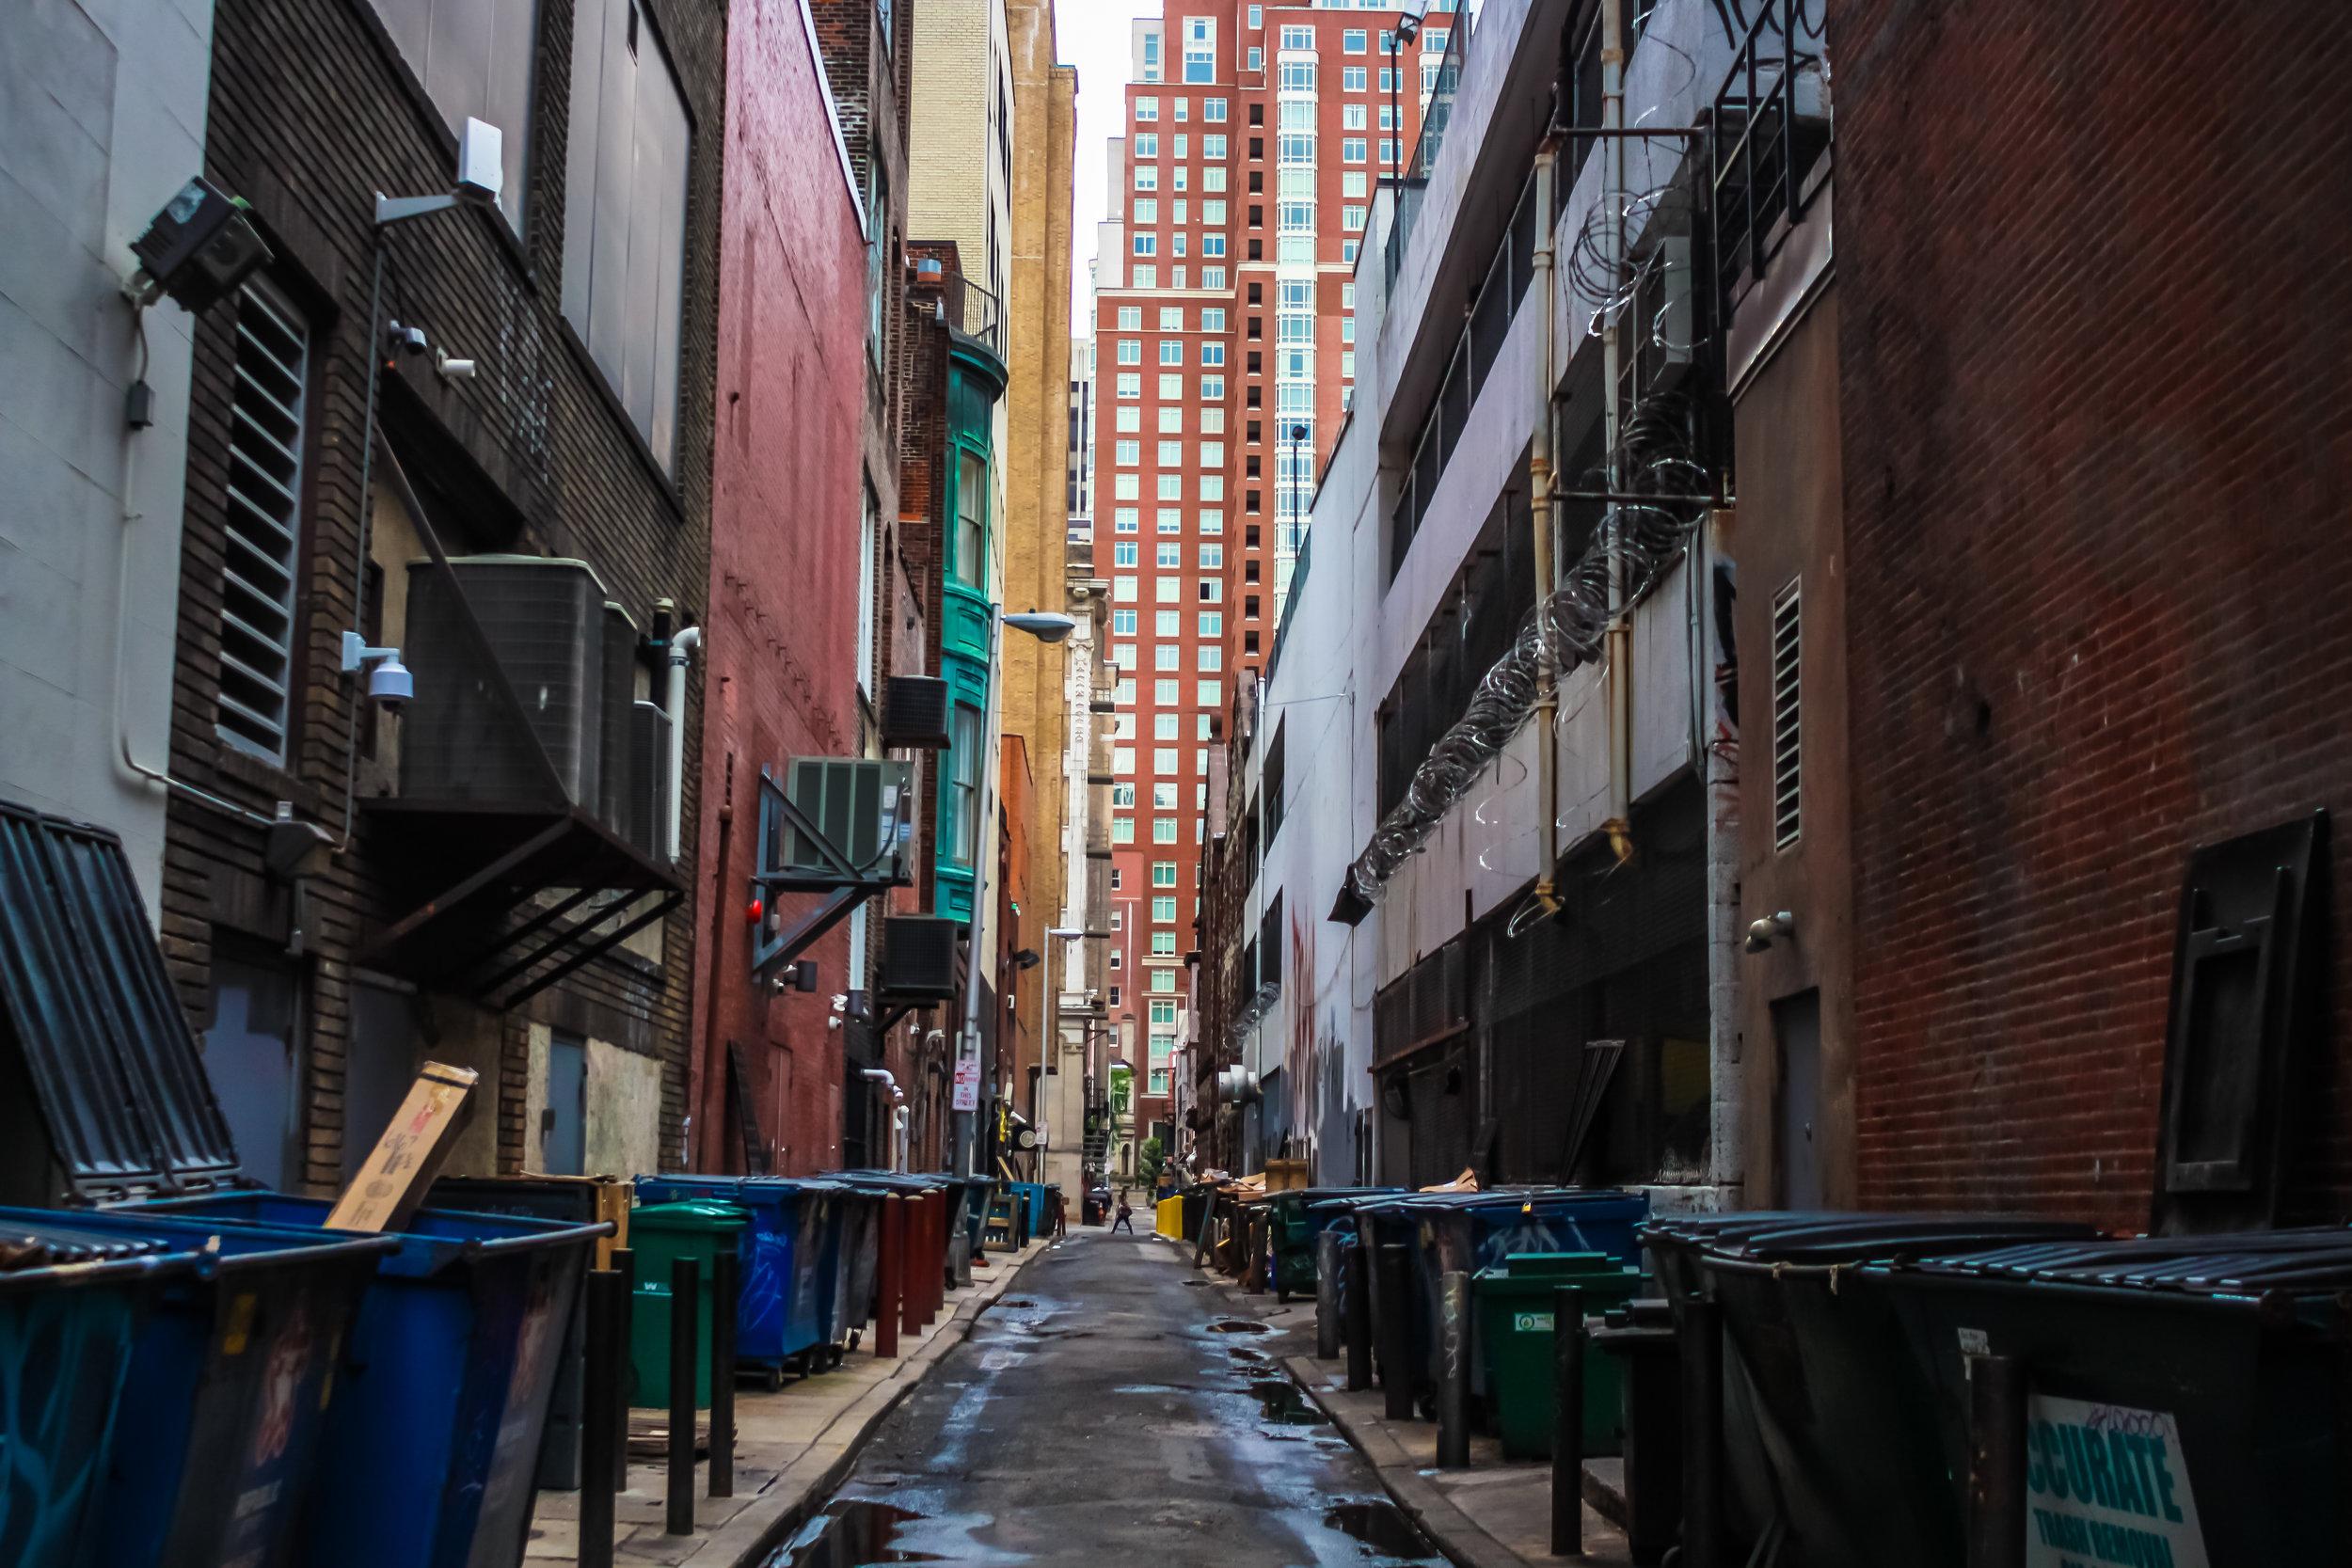 Dumpster alley 7.jpg